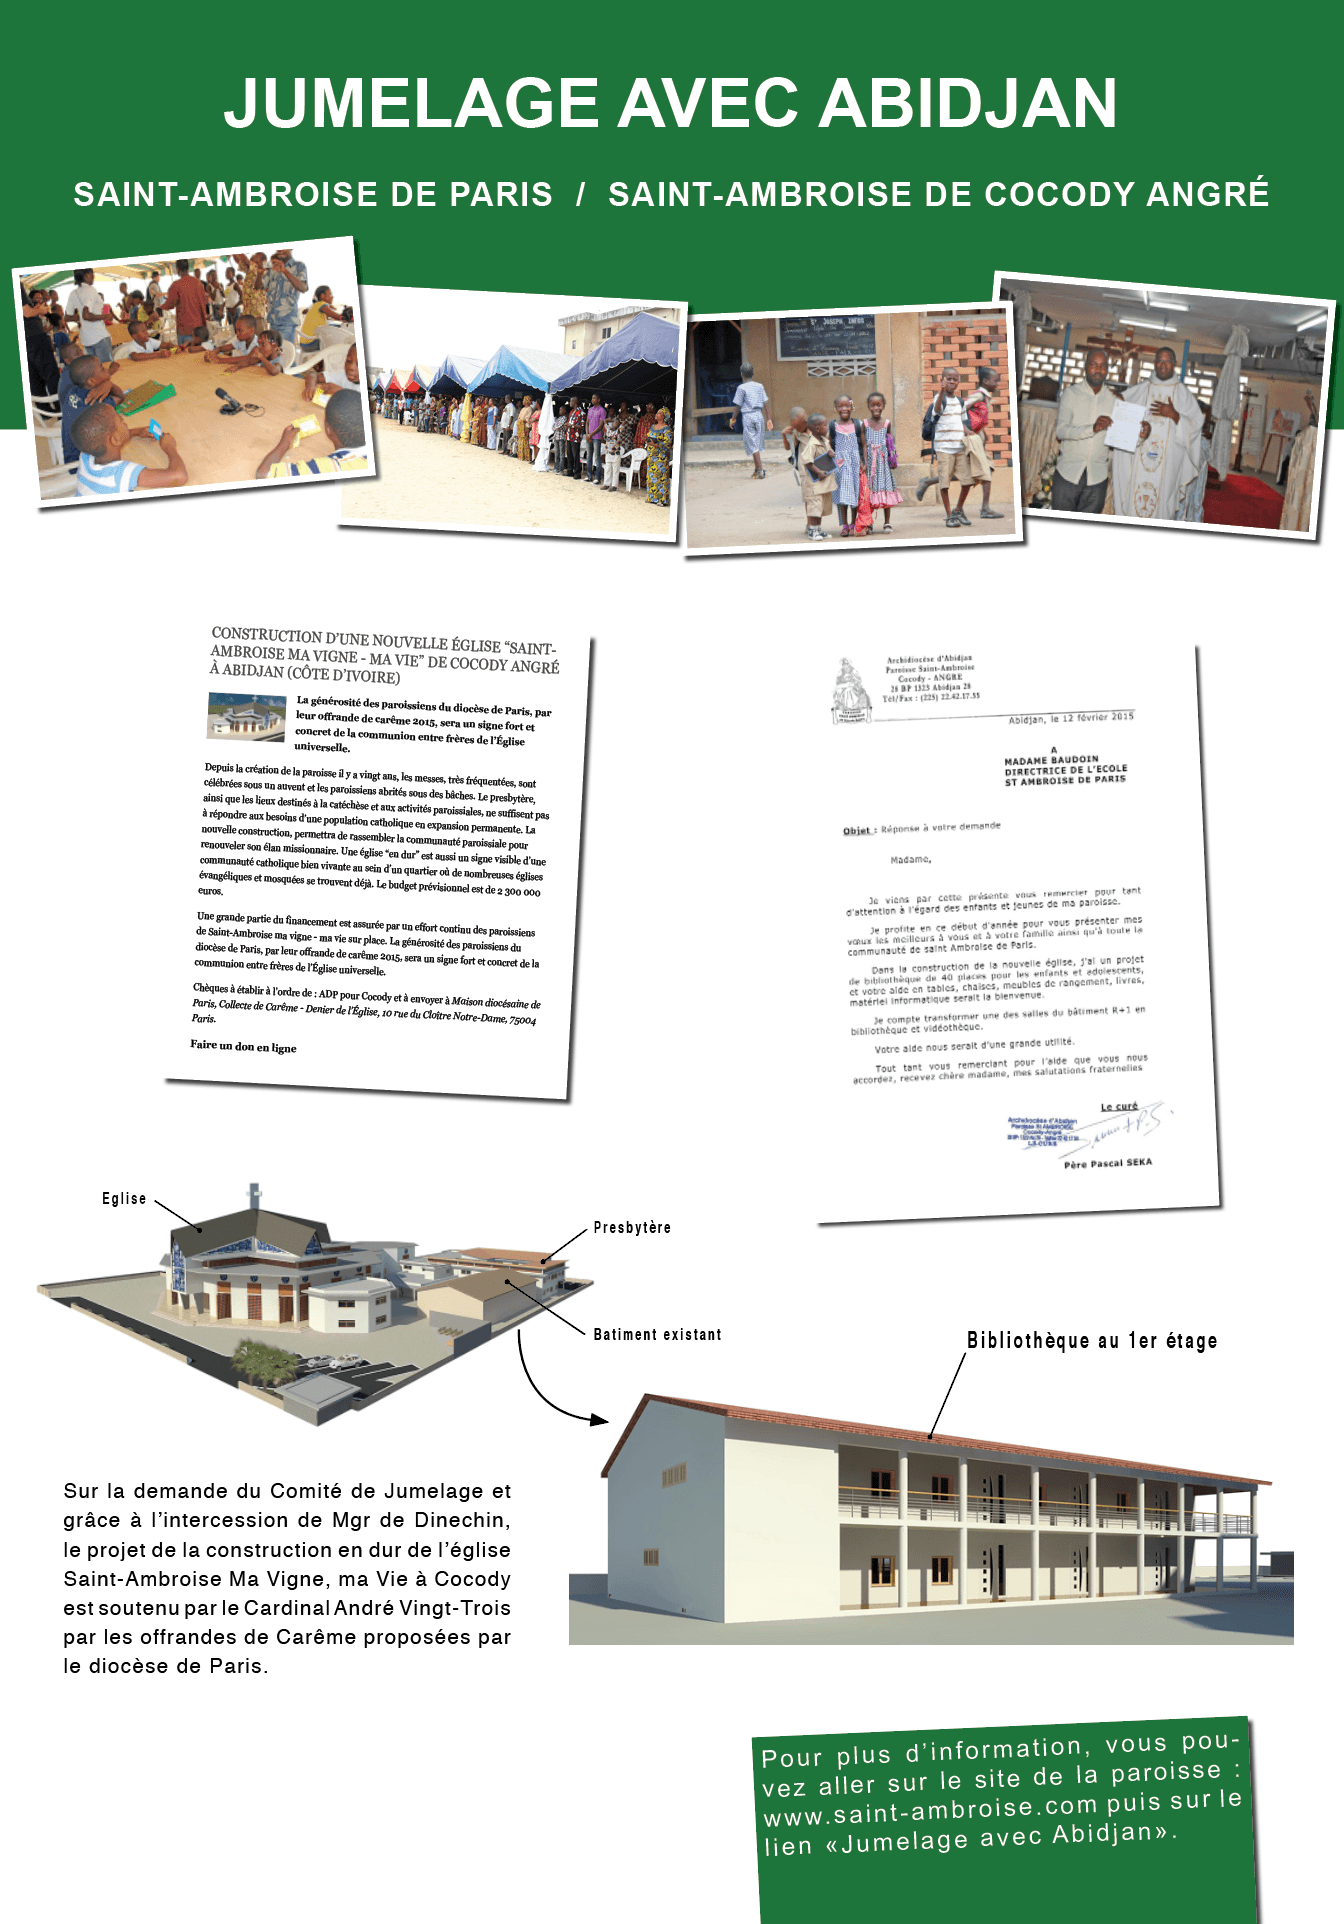 Panneau jumelage Abidjan 2014 2015